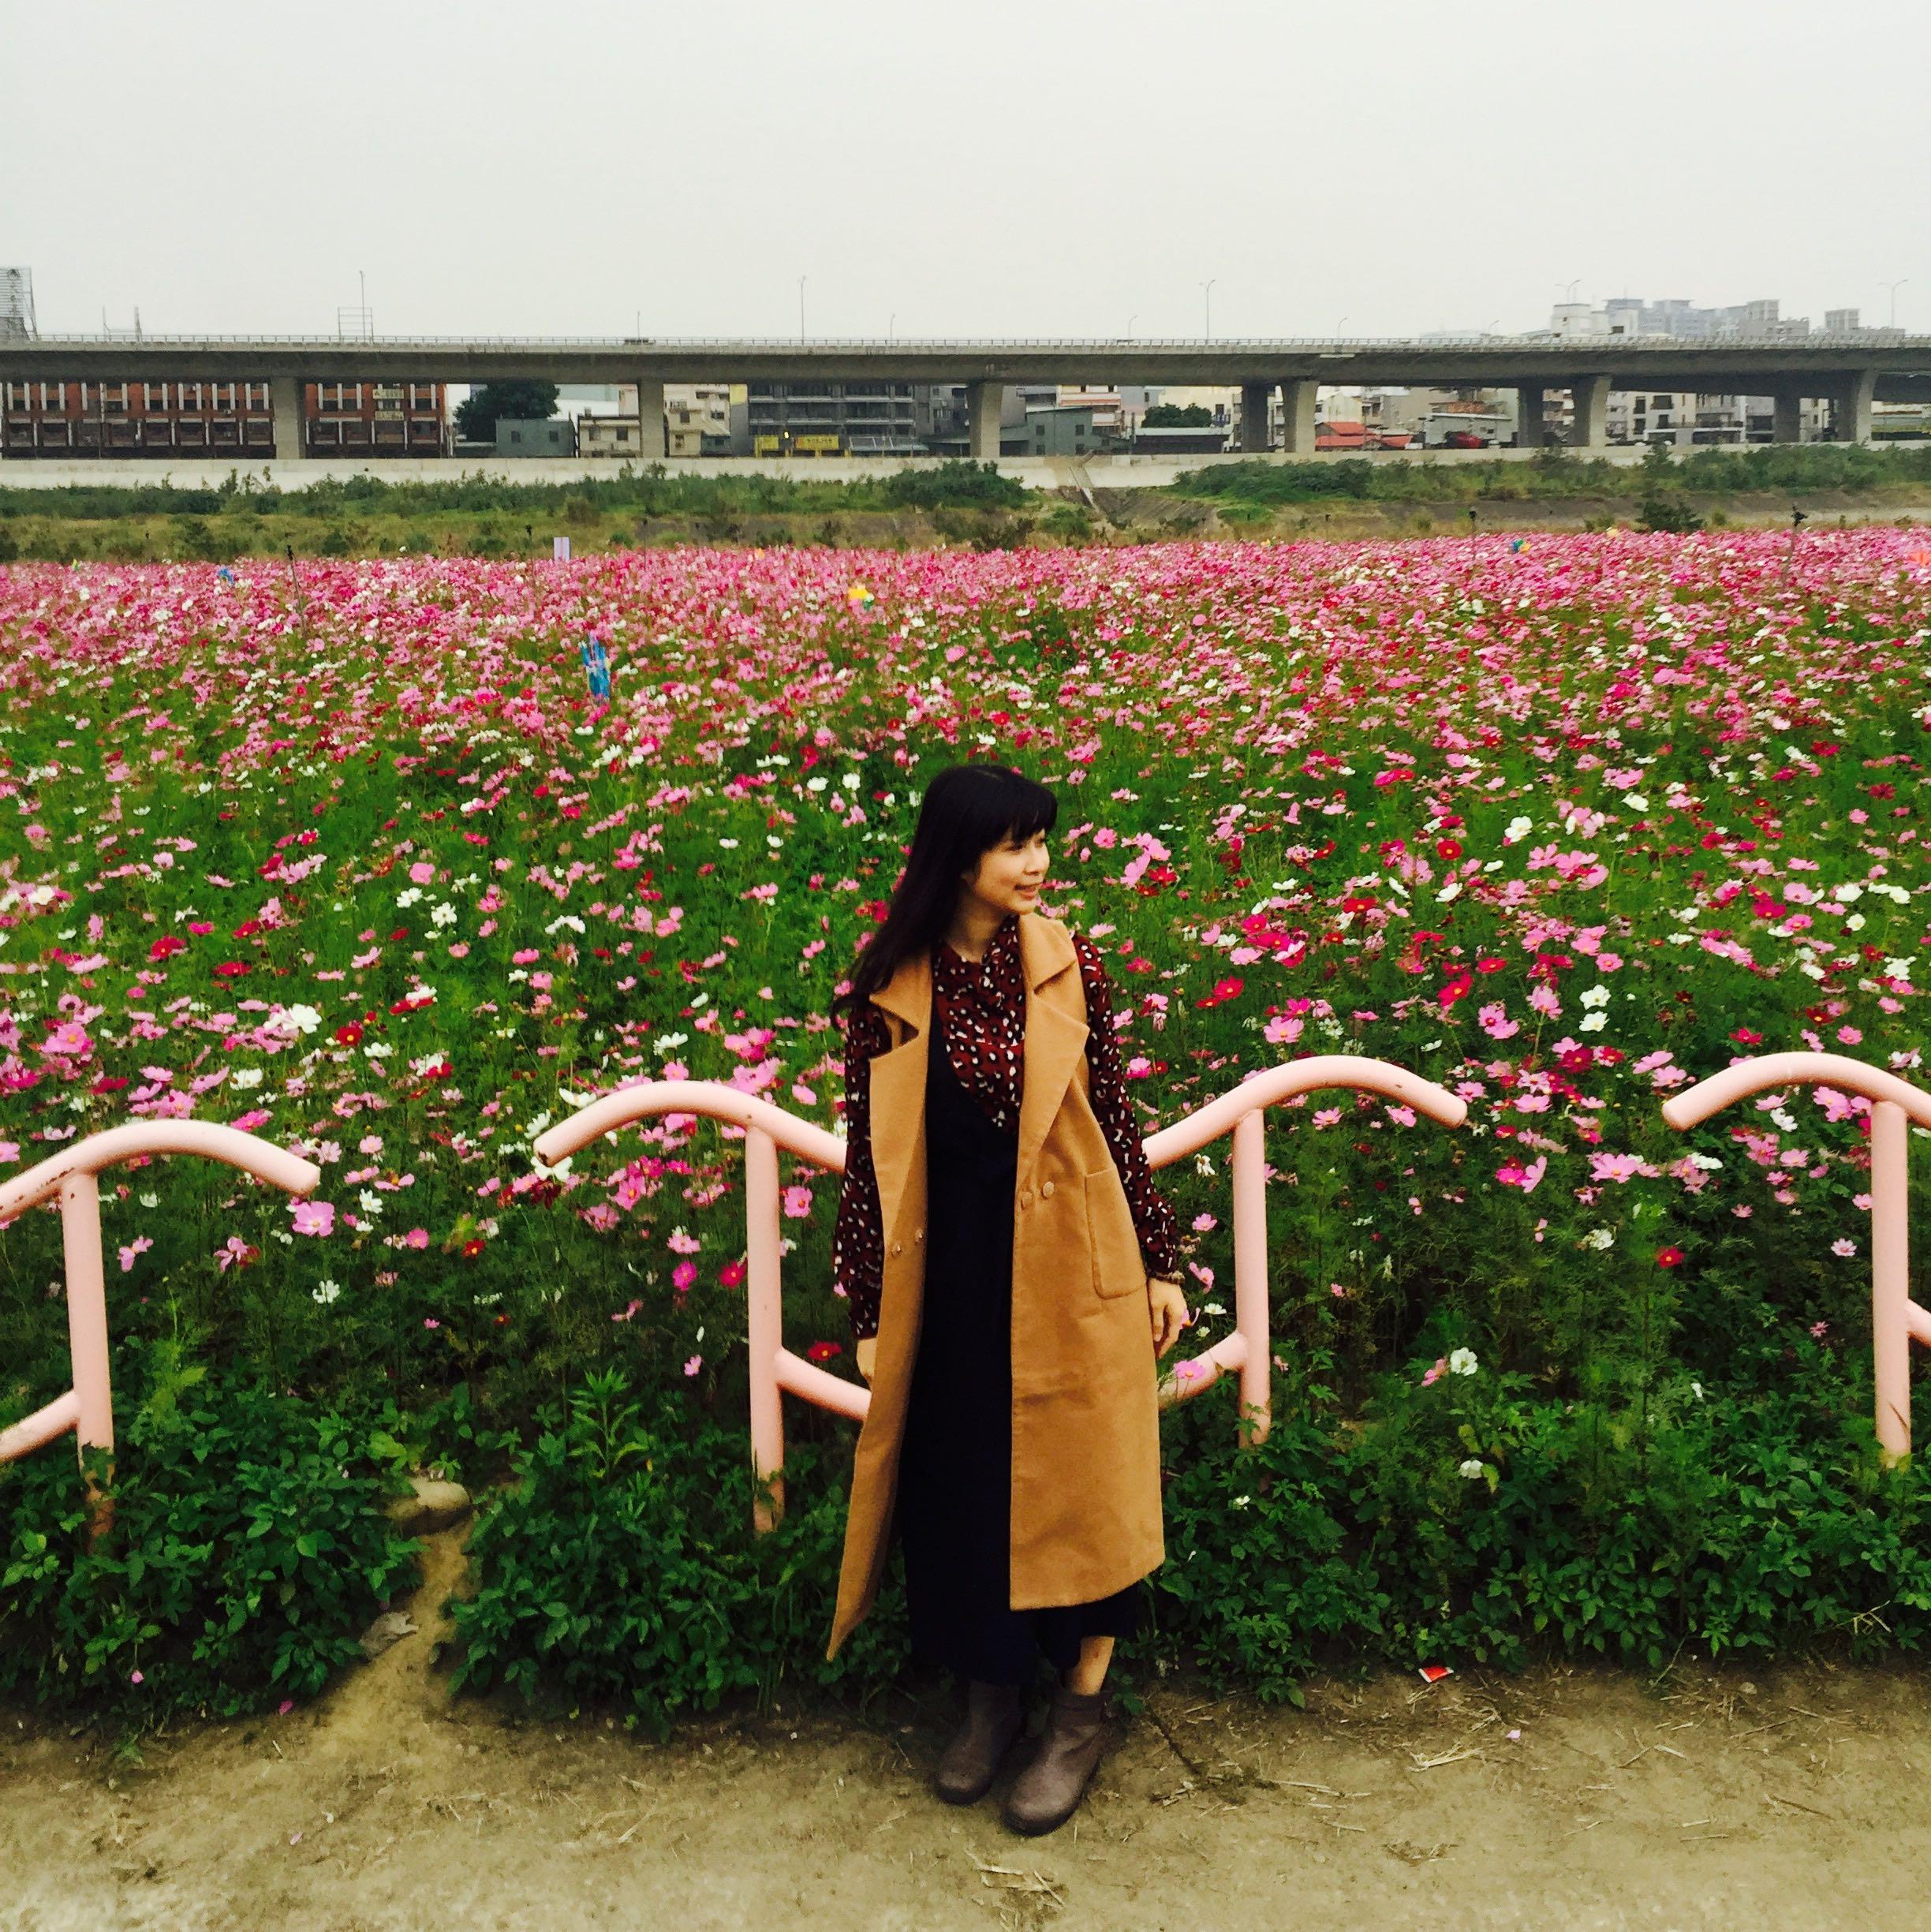 hanhanhuang